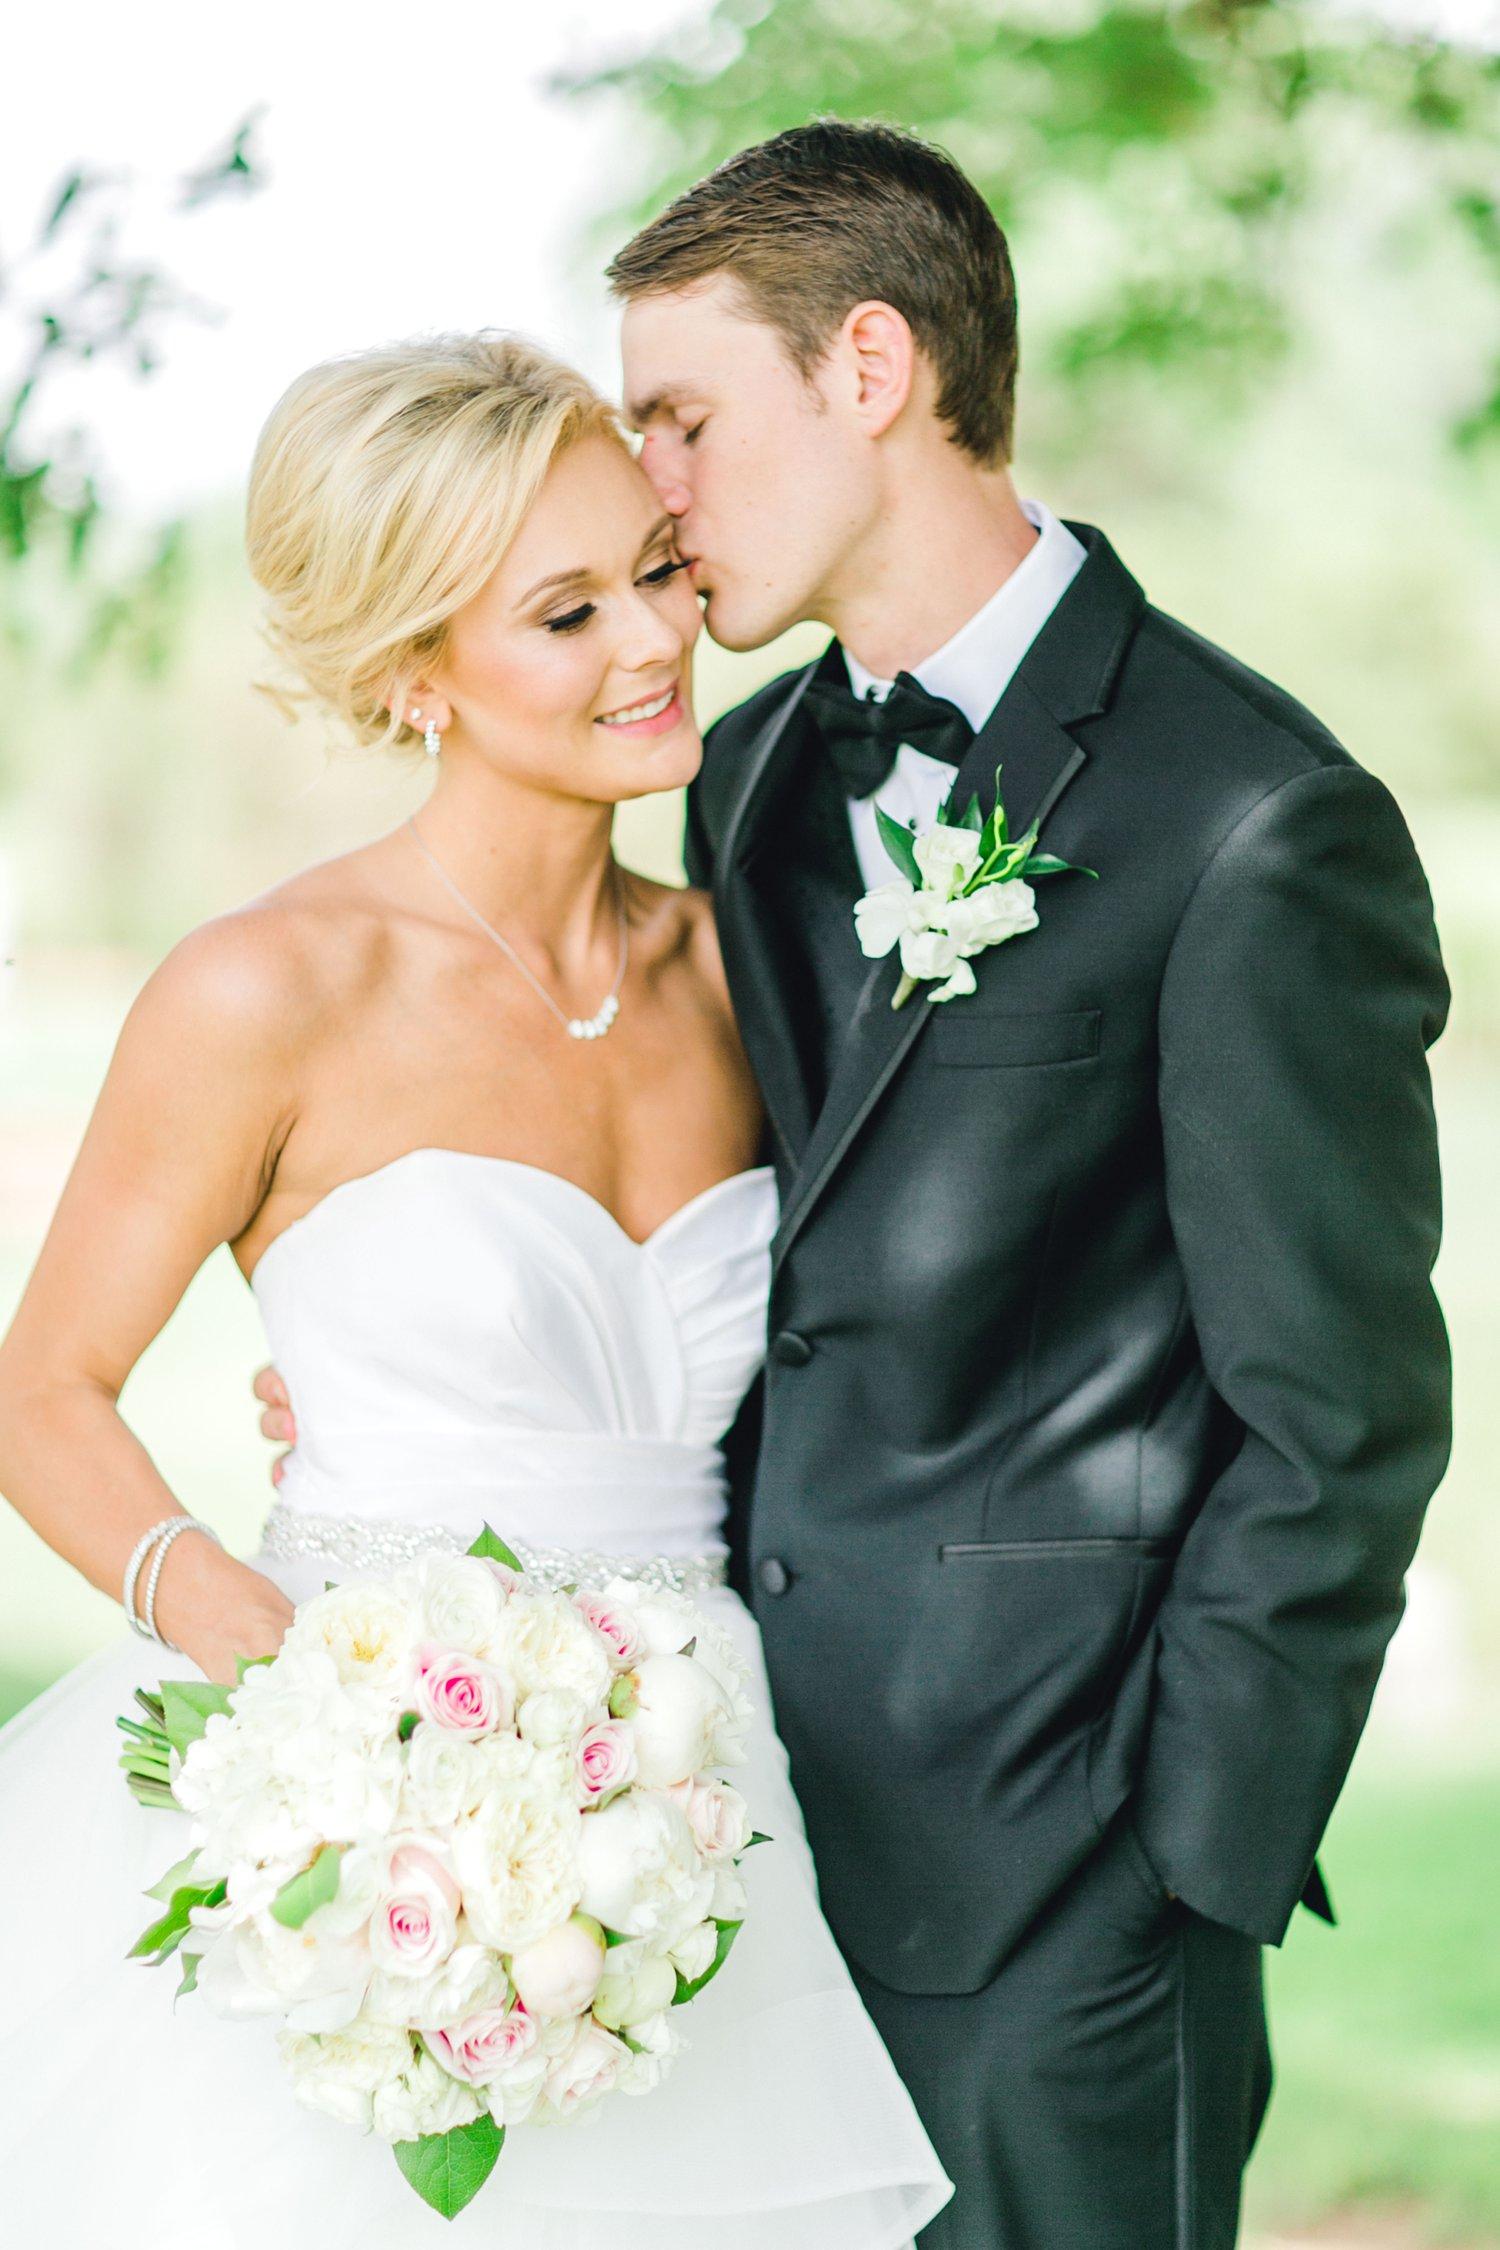 Taylor-and-Brock-Williams-Texas-Tech-University-Merket-Alumni-Center-Lubbock-Photographer-ALLEEJ0060.jpg